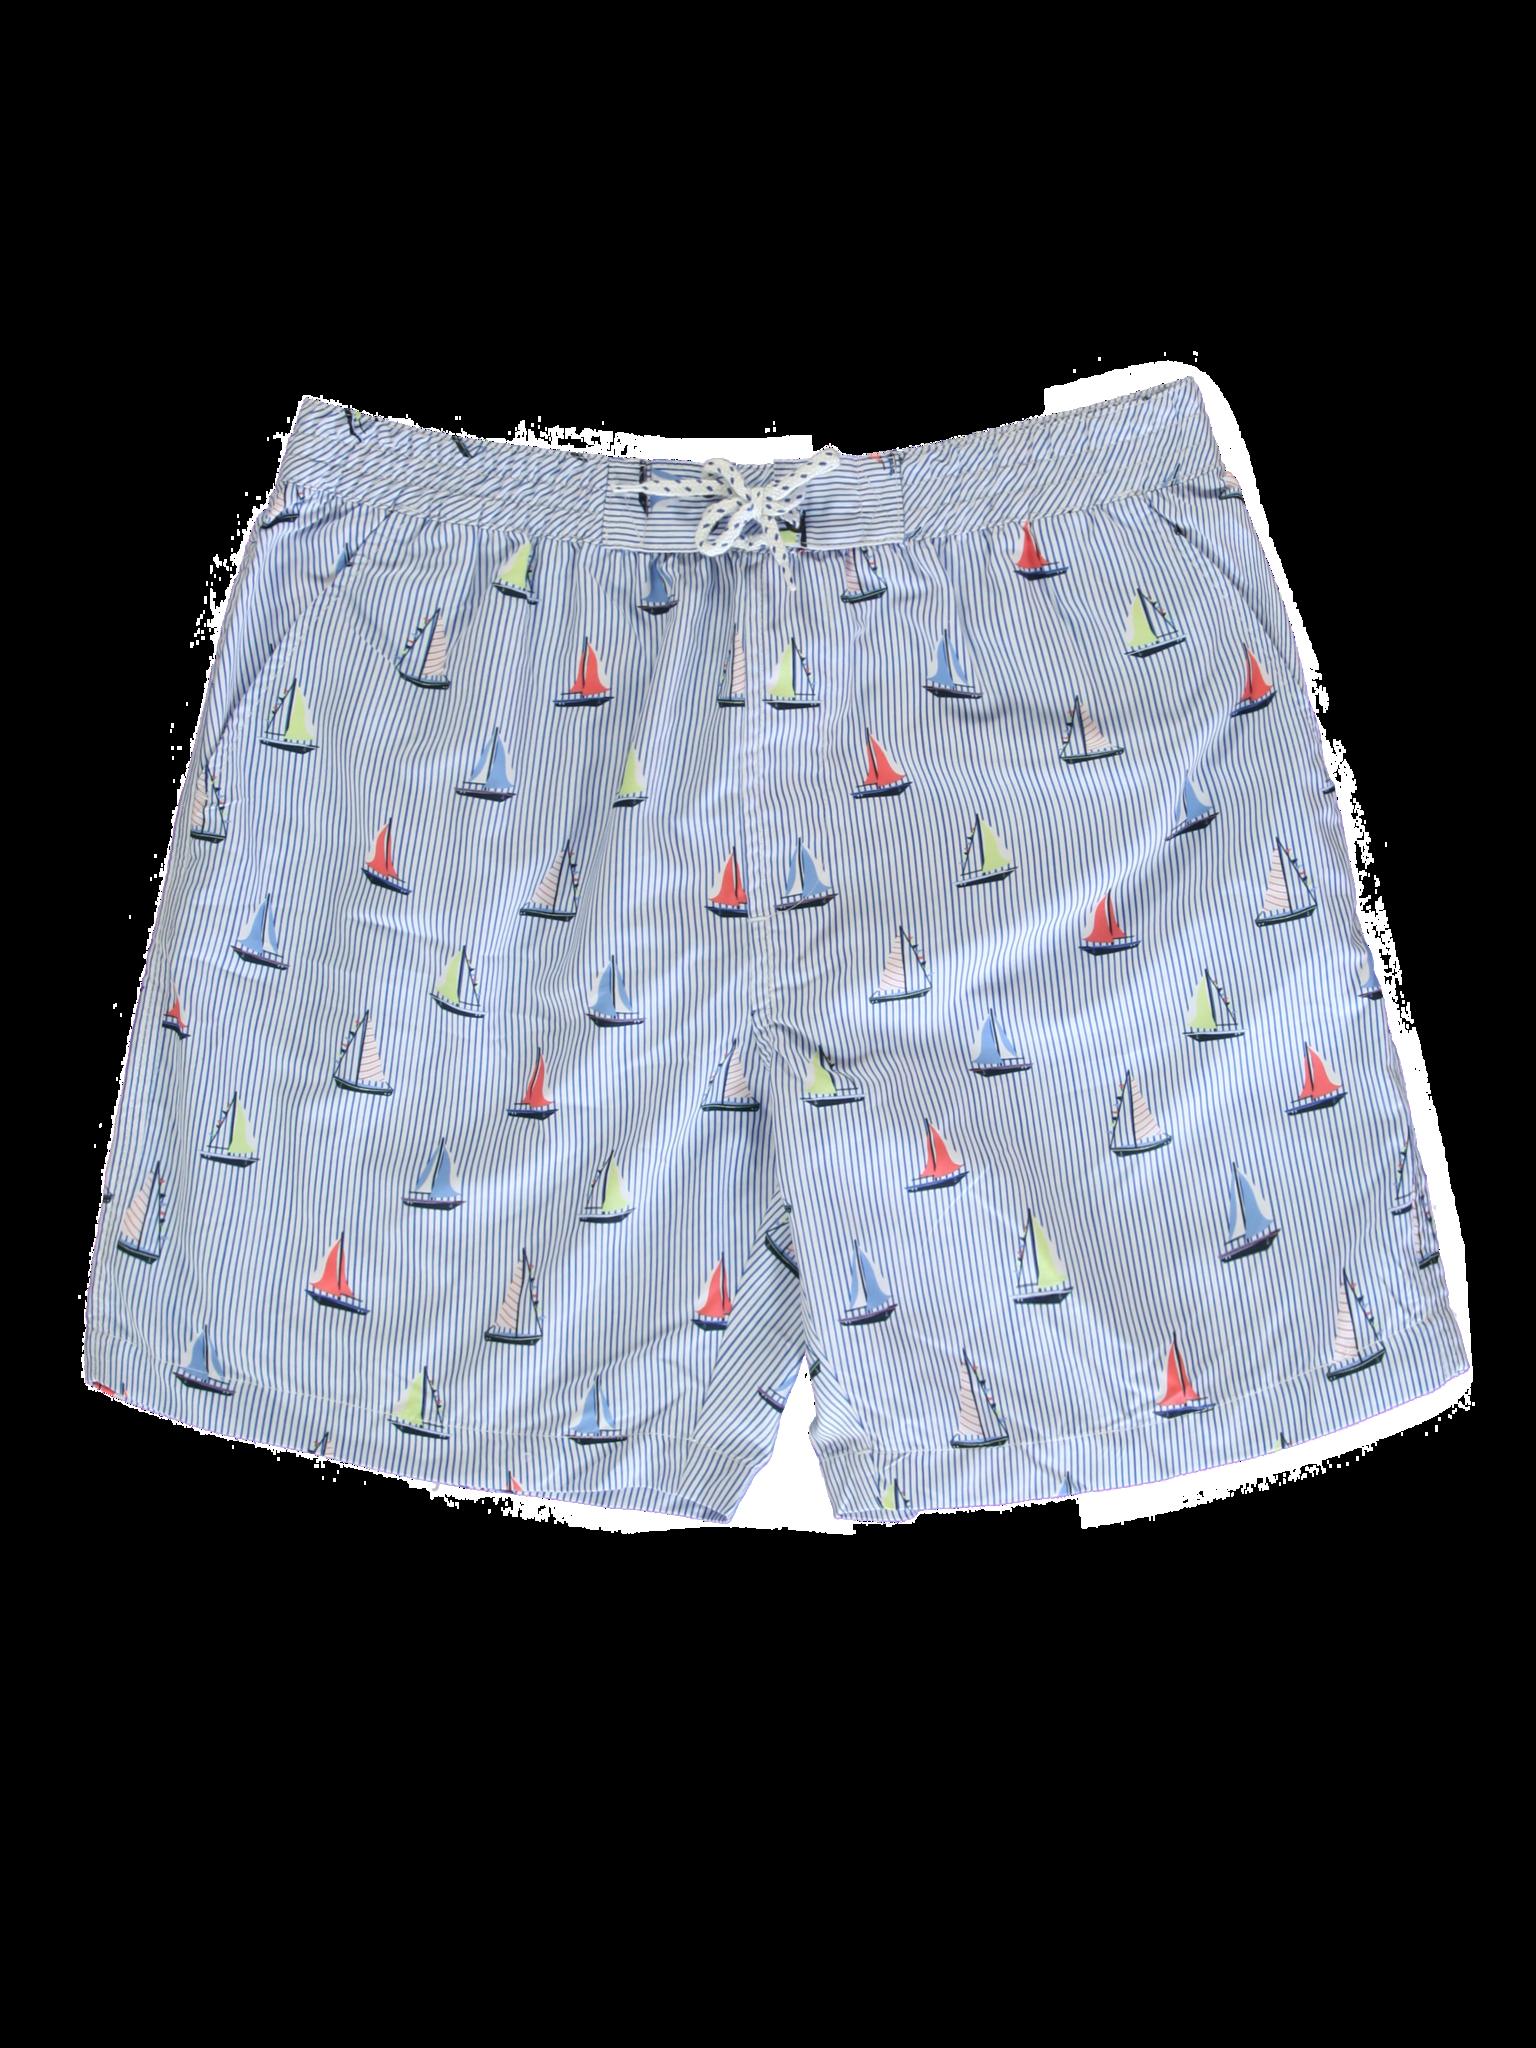 All Brands | Summerproducts Men | Swimwear | 24 pcs/box